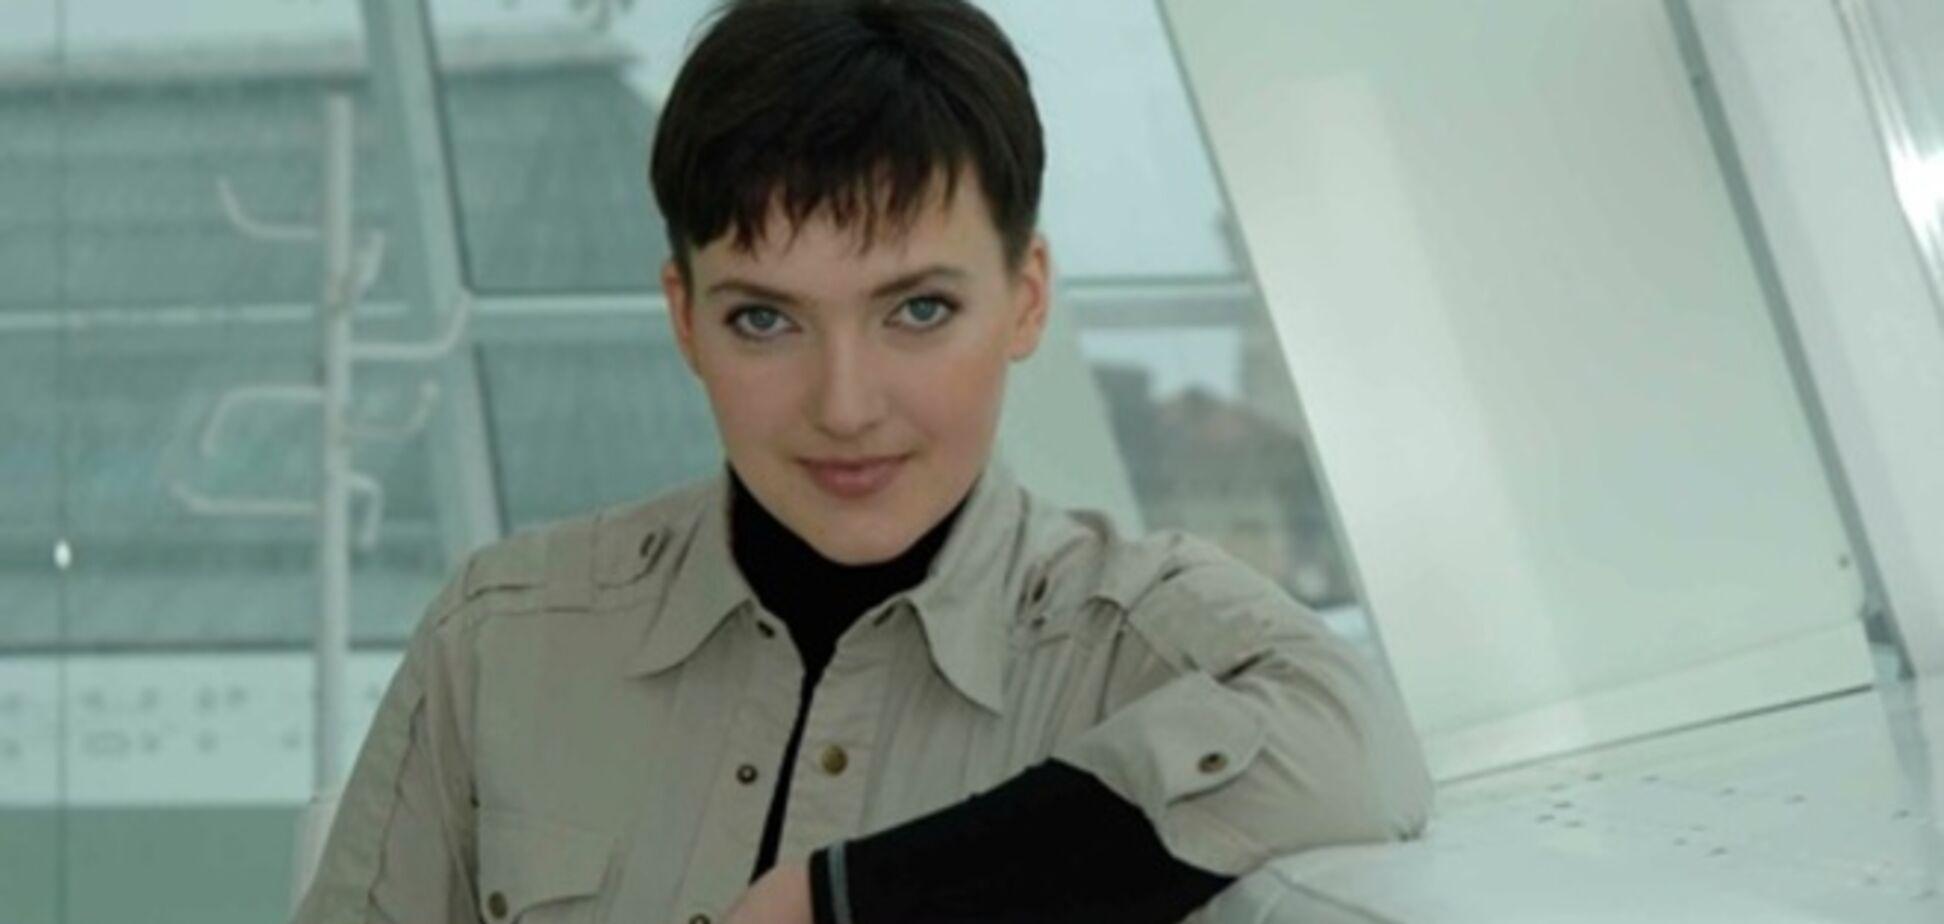 Украинская летчица Савченко объявила голодовку в СИЗО